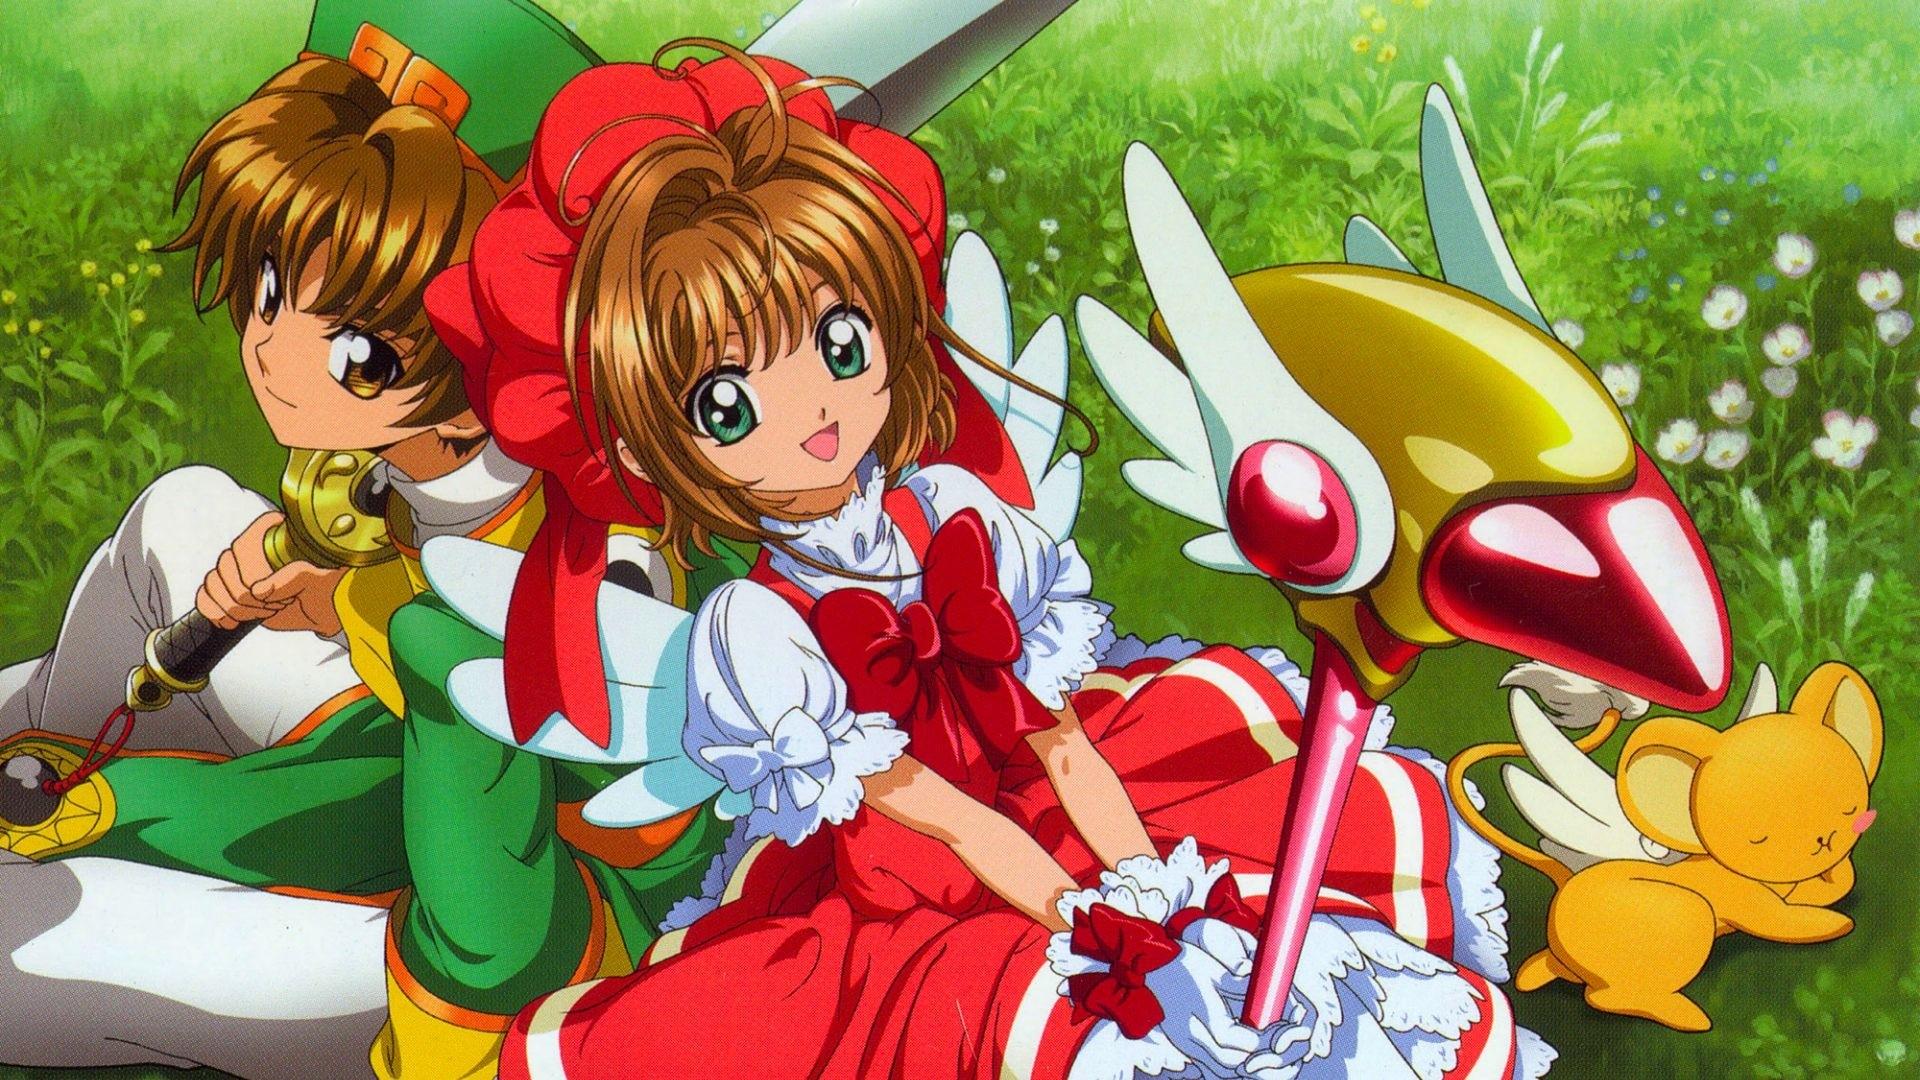 Cardcaptor Sakura wallpapers - HD wallpaper Collections ...